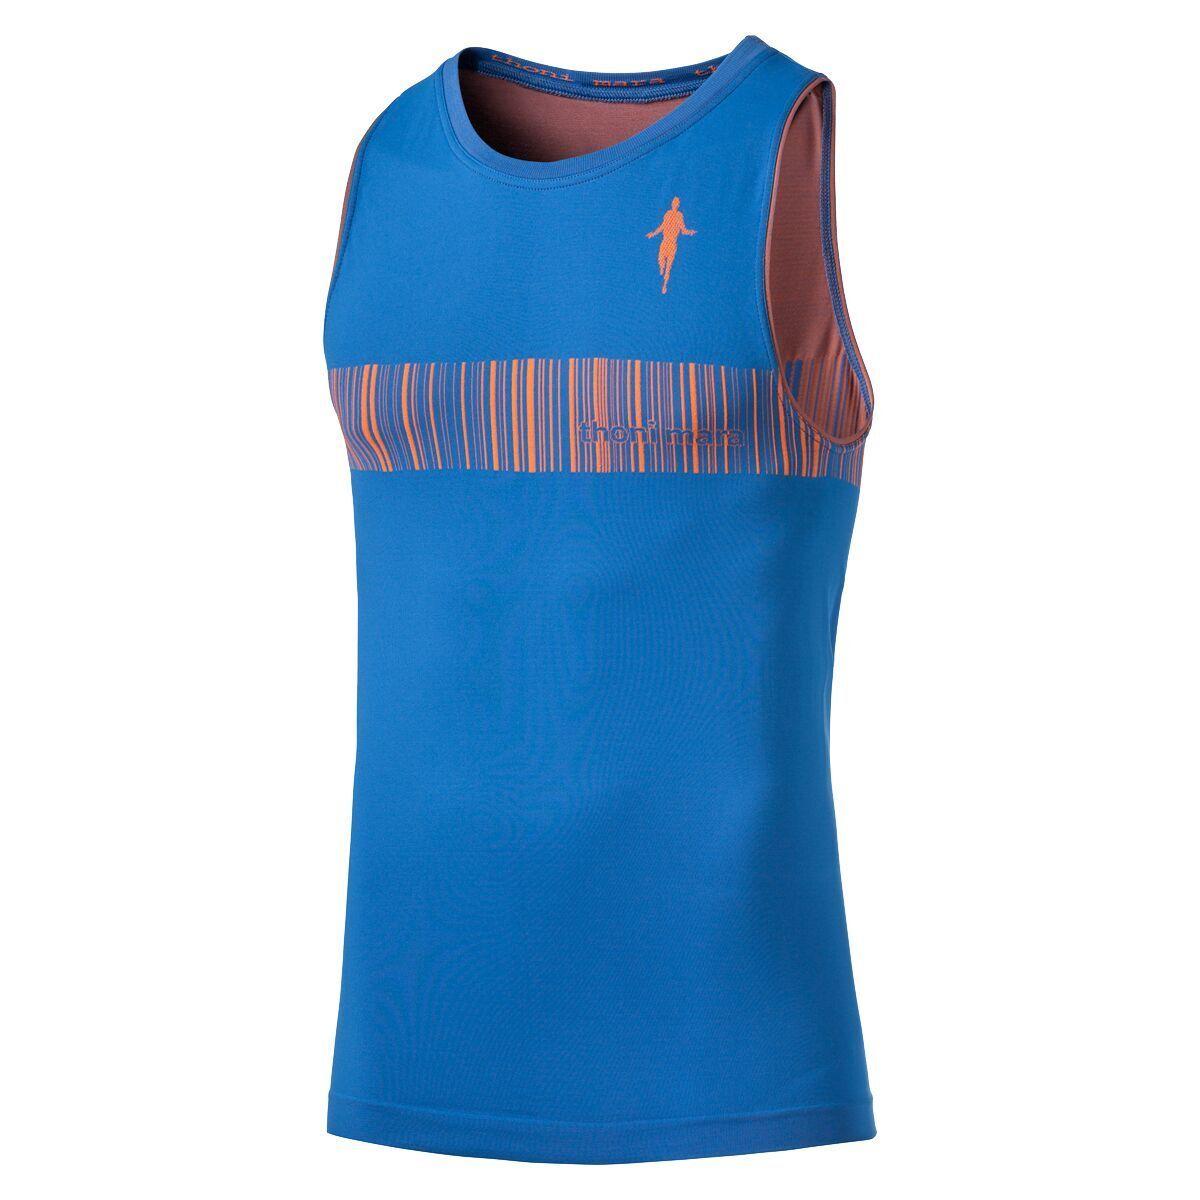 Thonimara Sommer OA Shirt EAN in Blau Orange